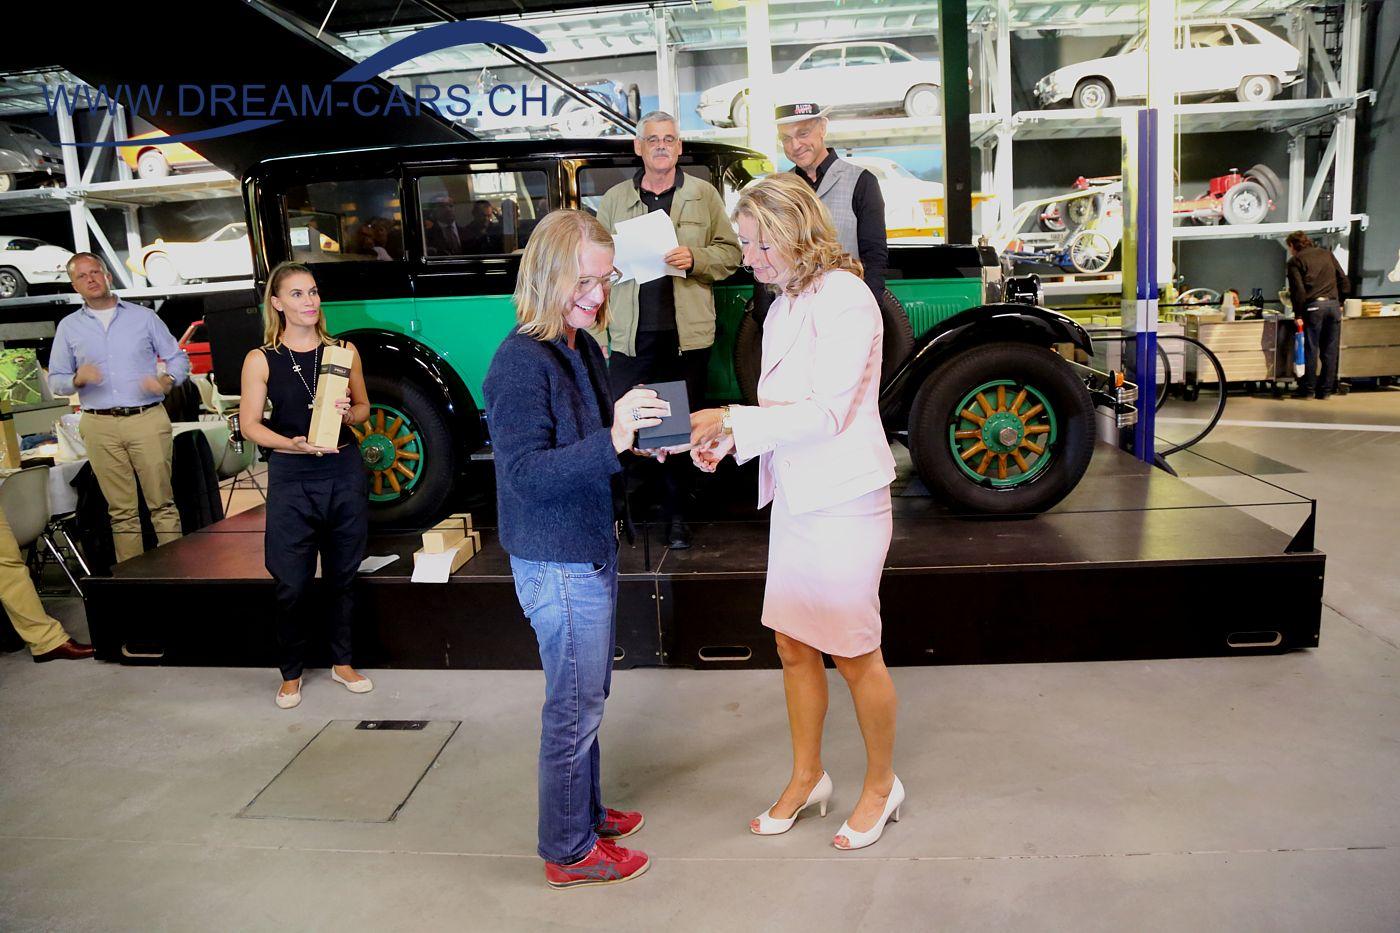 Concours d'Excellence Luzern, 17. September 2016. Preisverleihung im Verkehrshaus Luzern